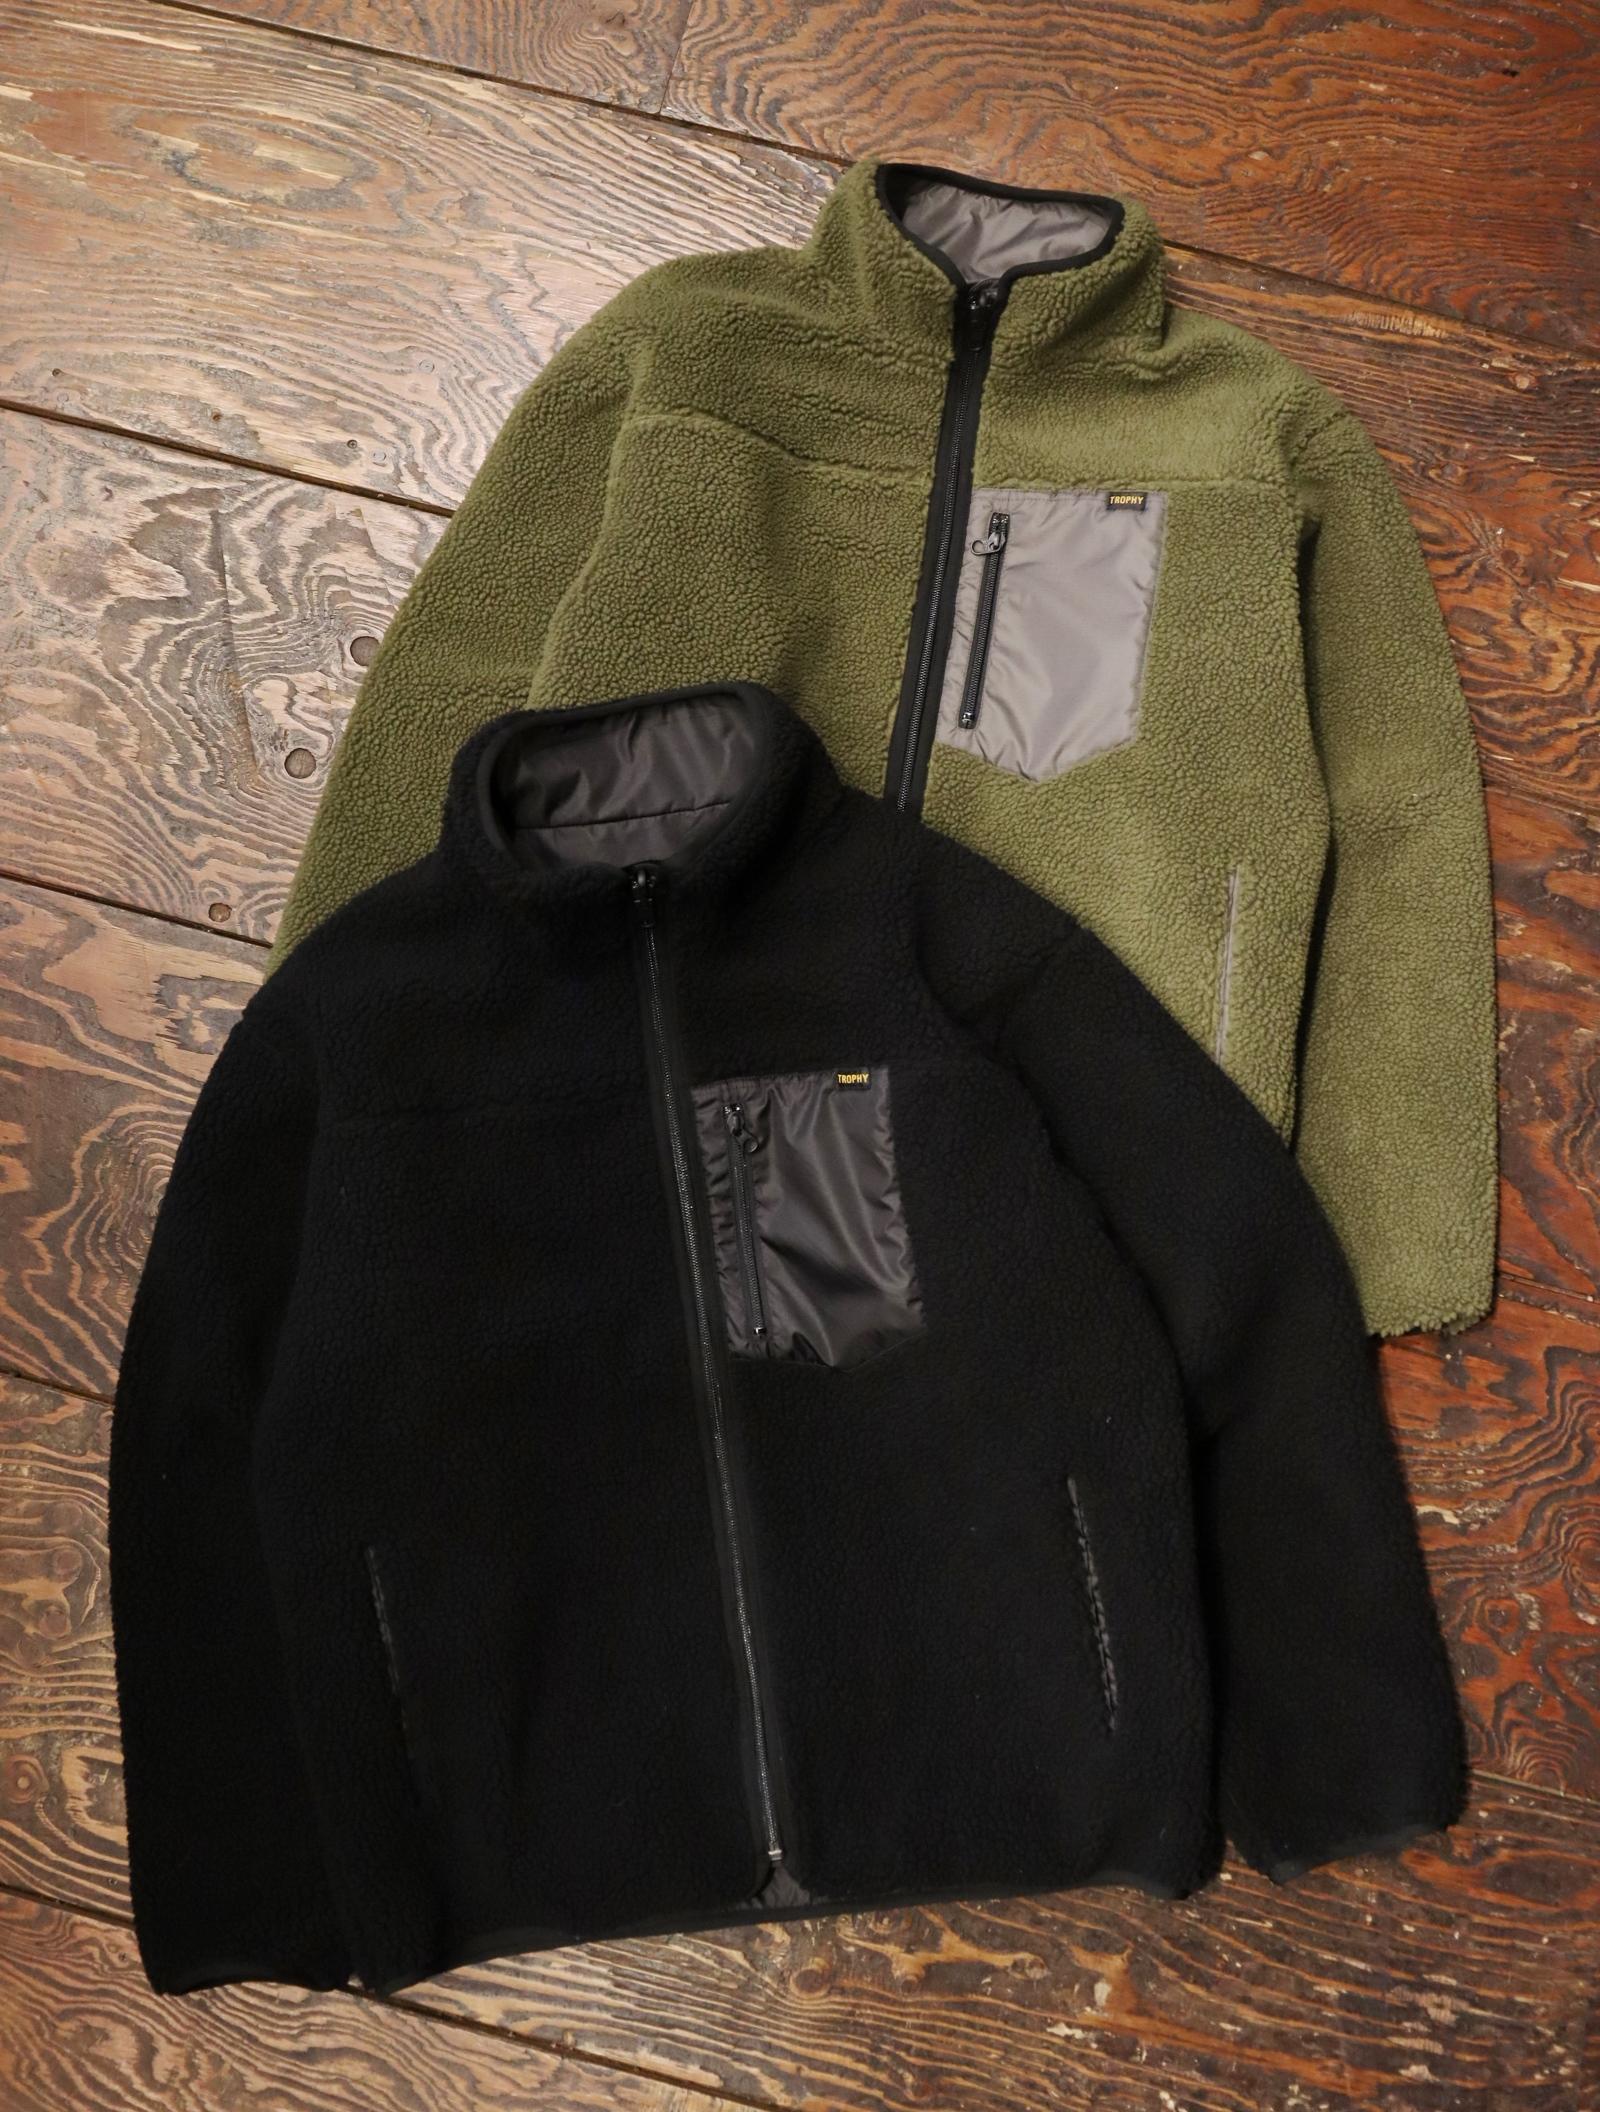 TROPHY CLOTHING  「2 Face Mountain Jacket」  リバーシブルマウンテンジャケット